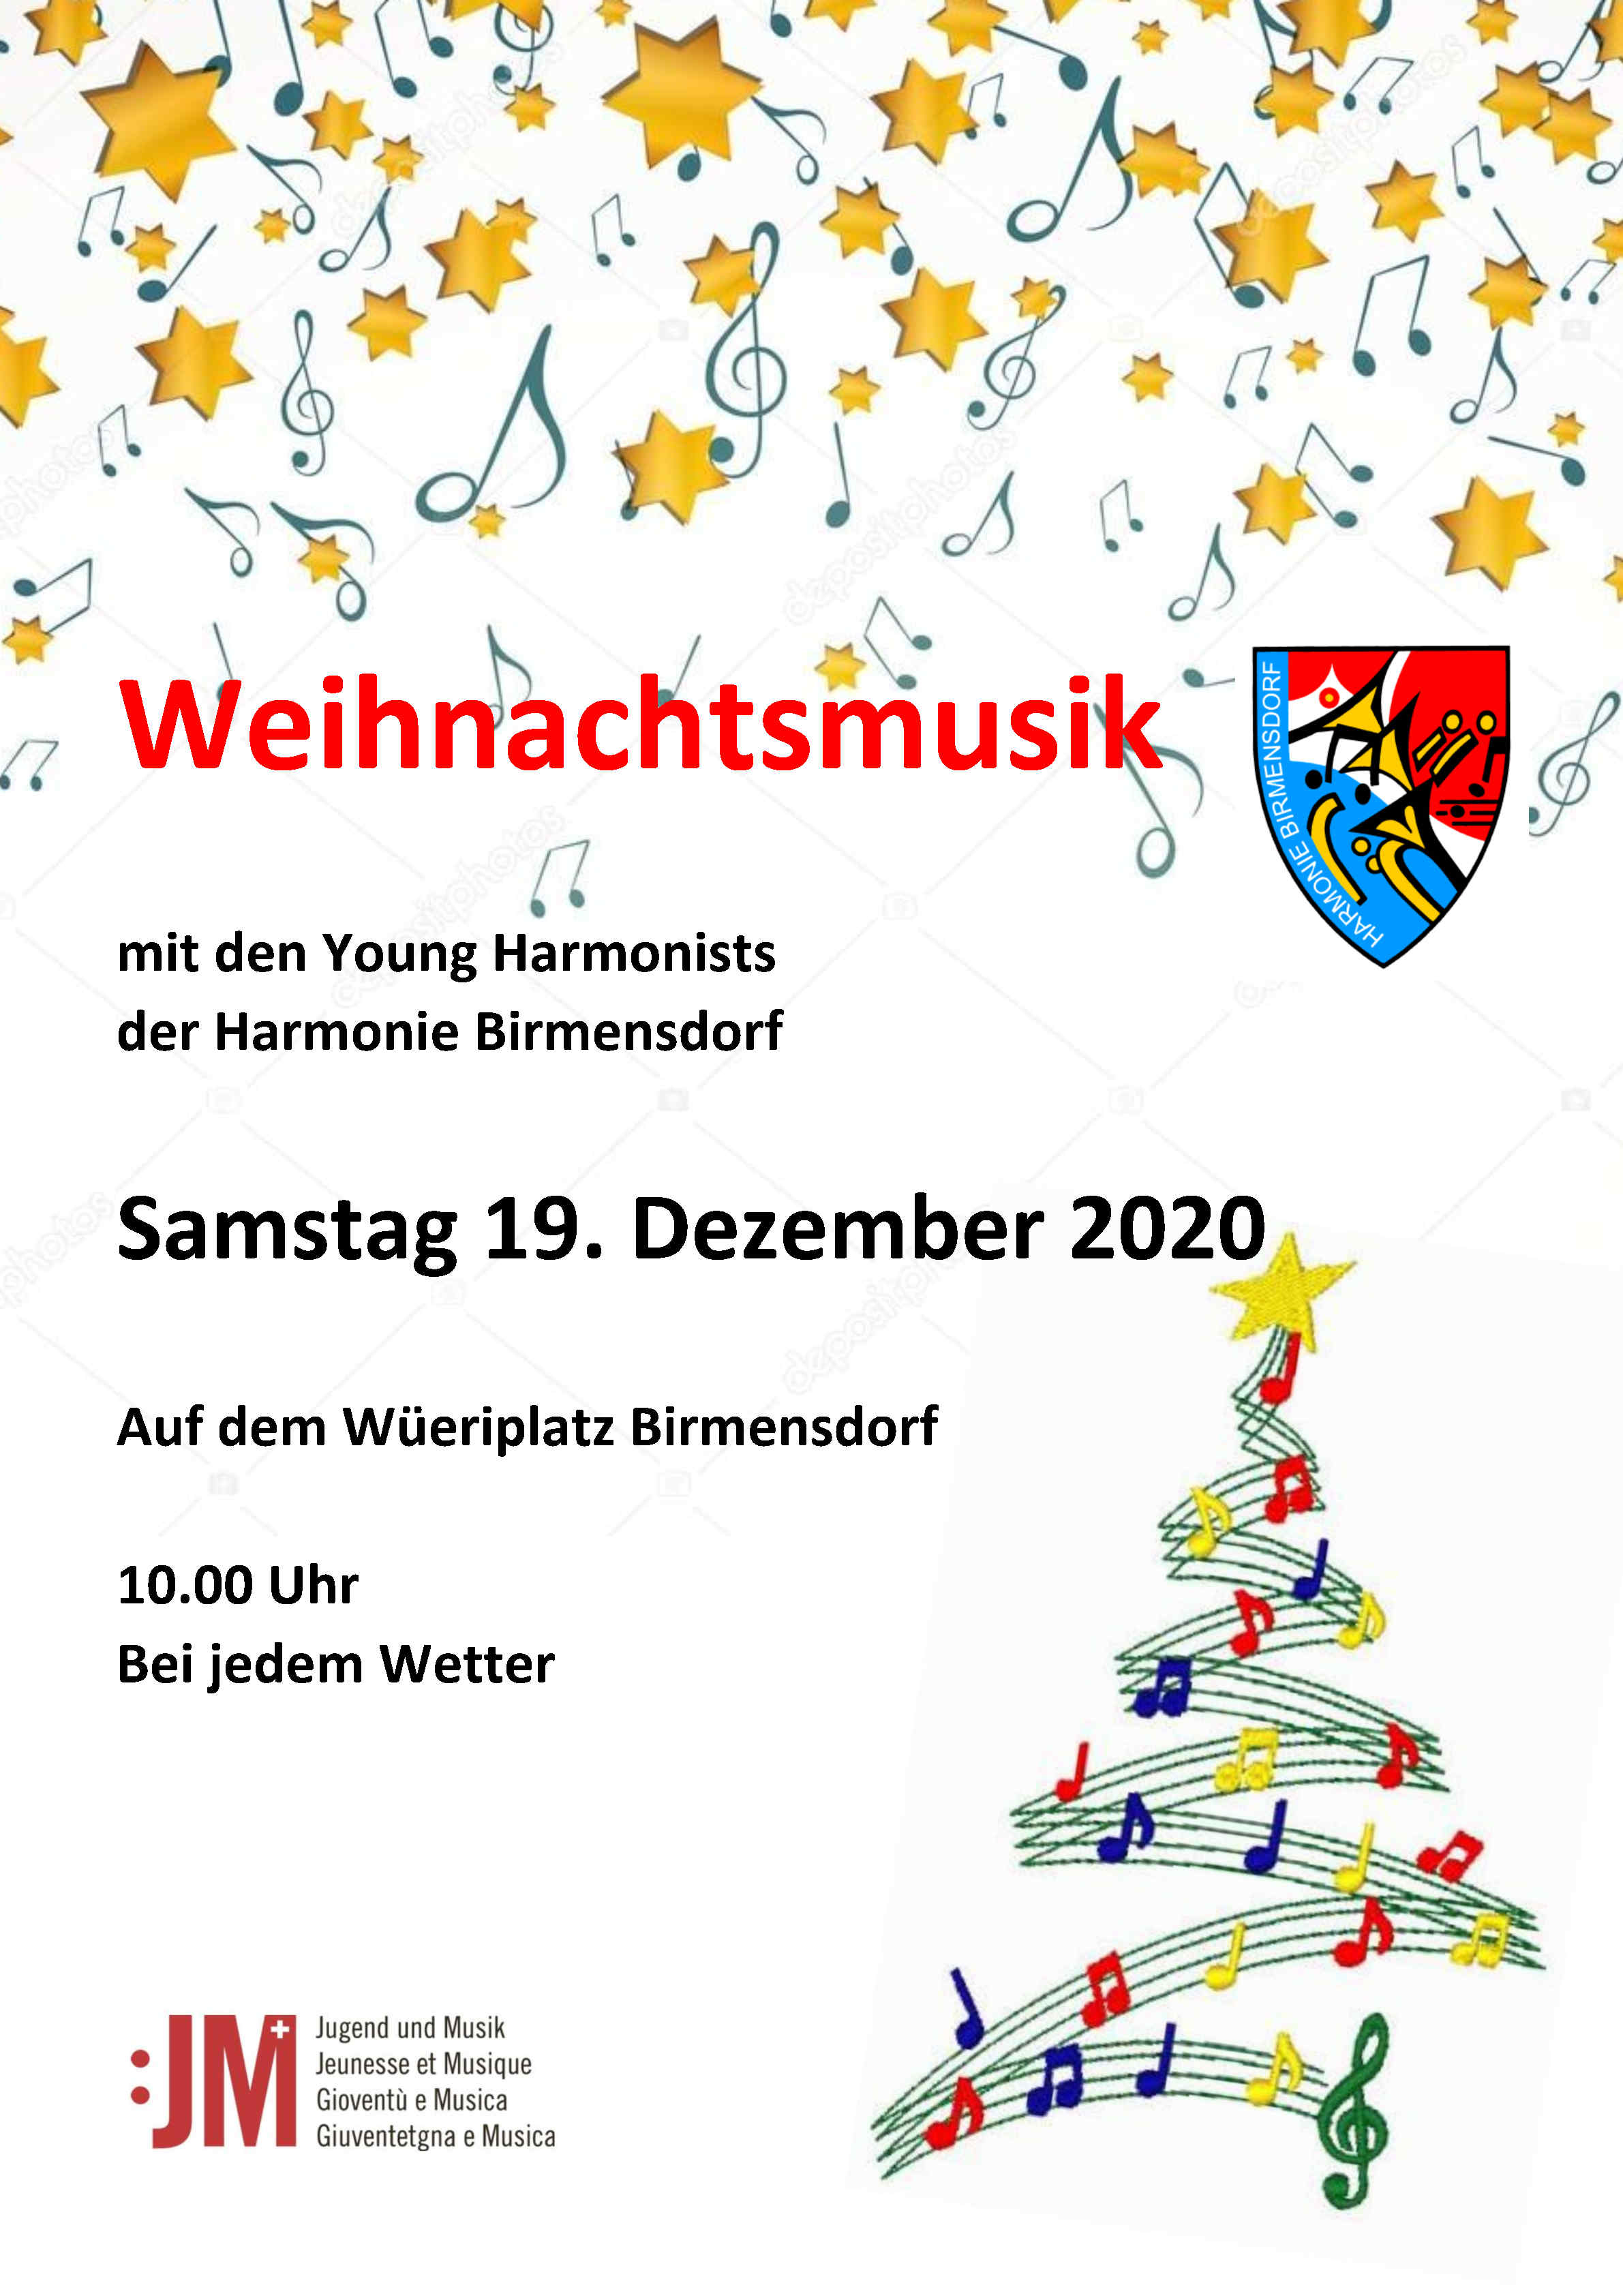 Weihnachtsmusik V10jpg